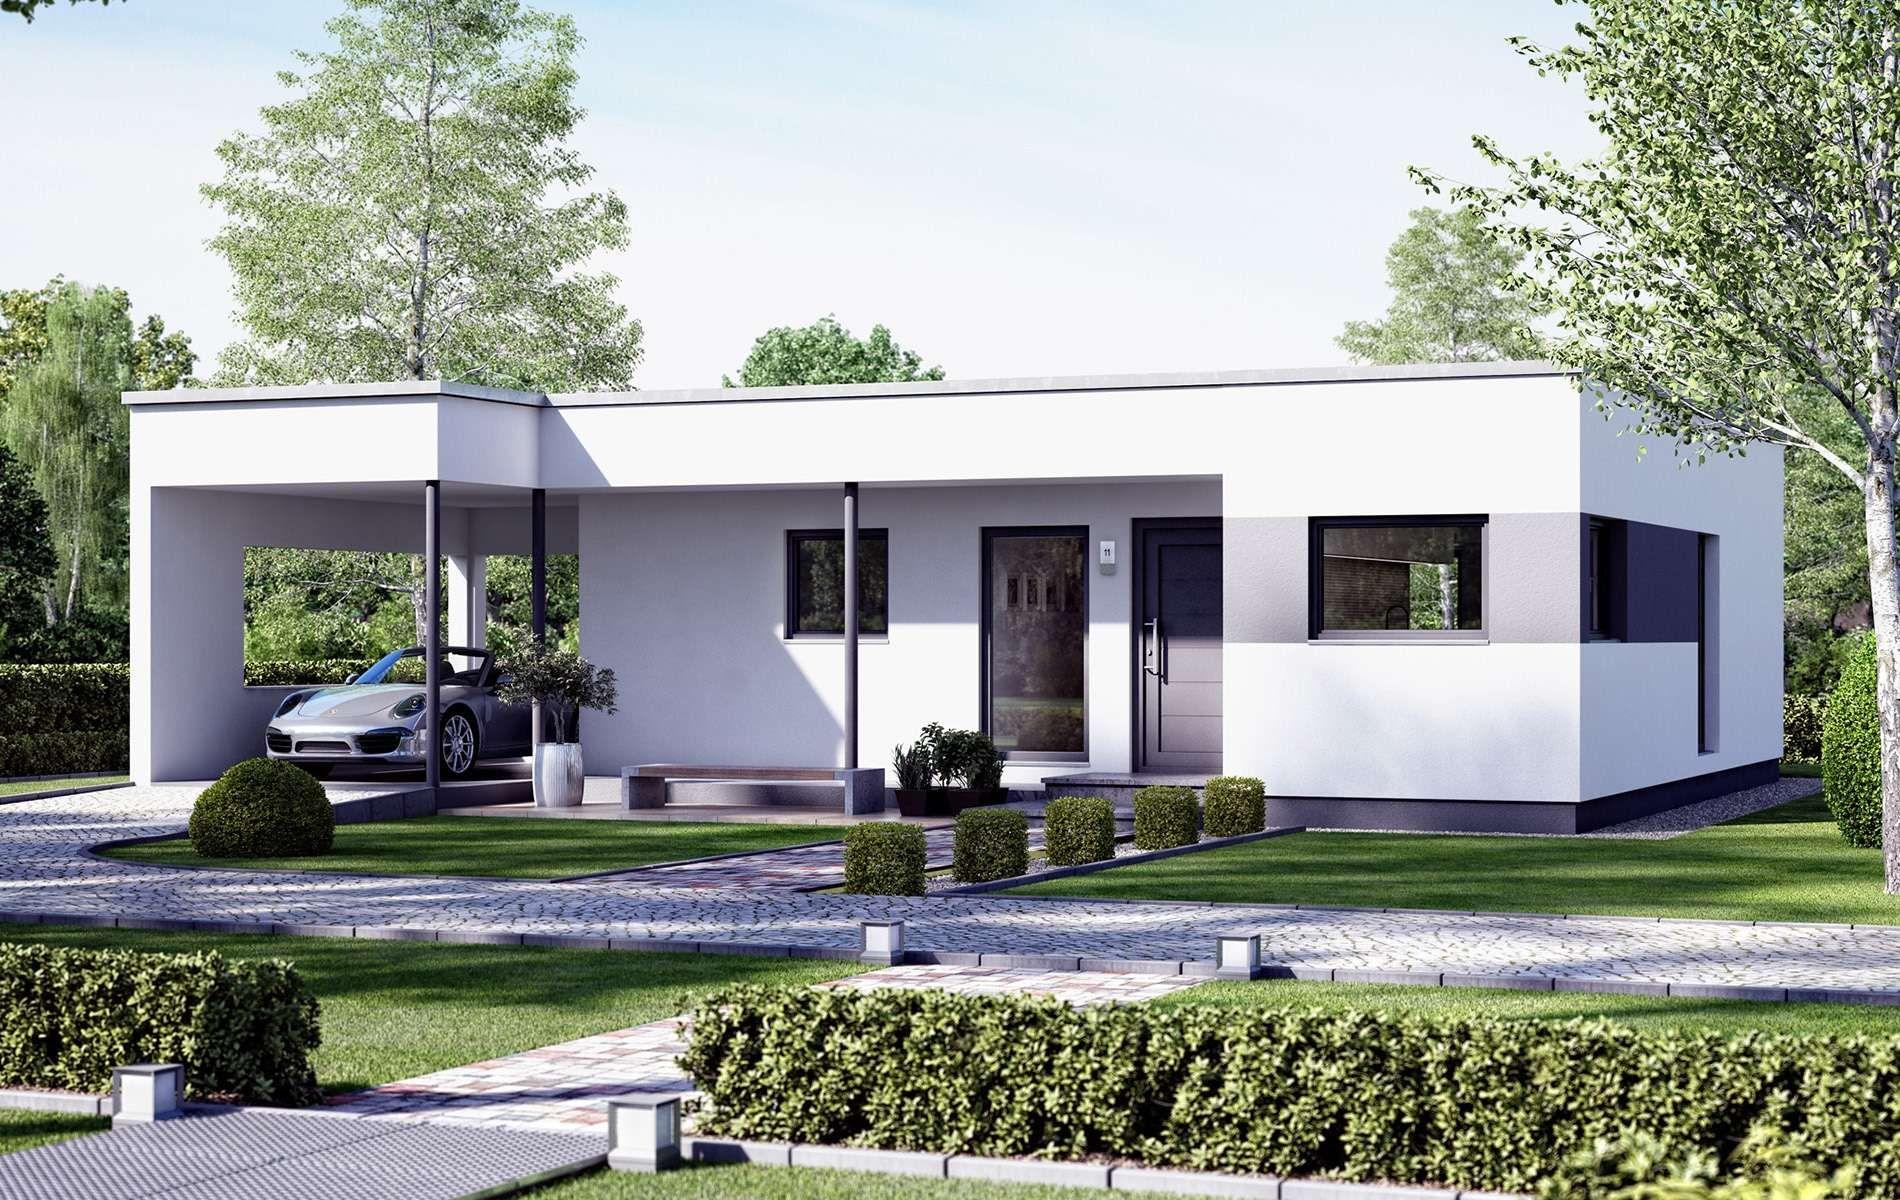 Living Haus Solution 78 V10 In 2020 Moderner Bungalow Living Haus Haus Bungalow